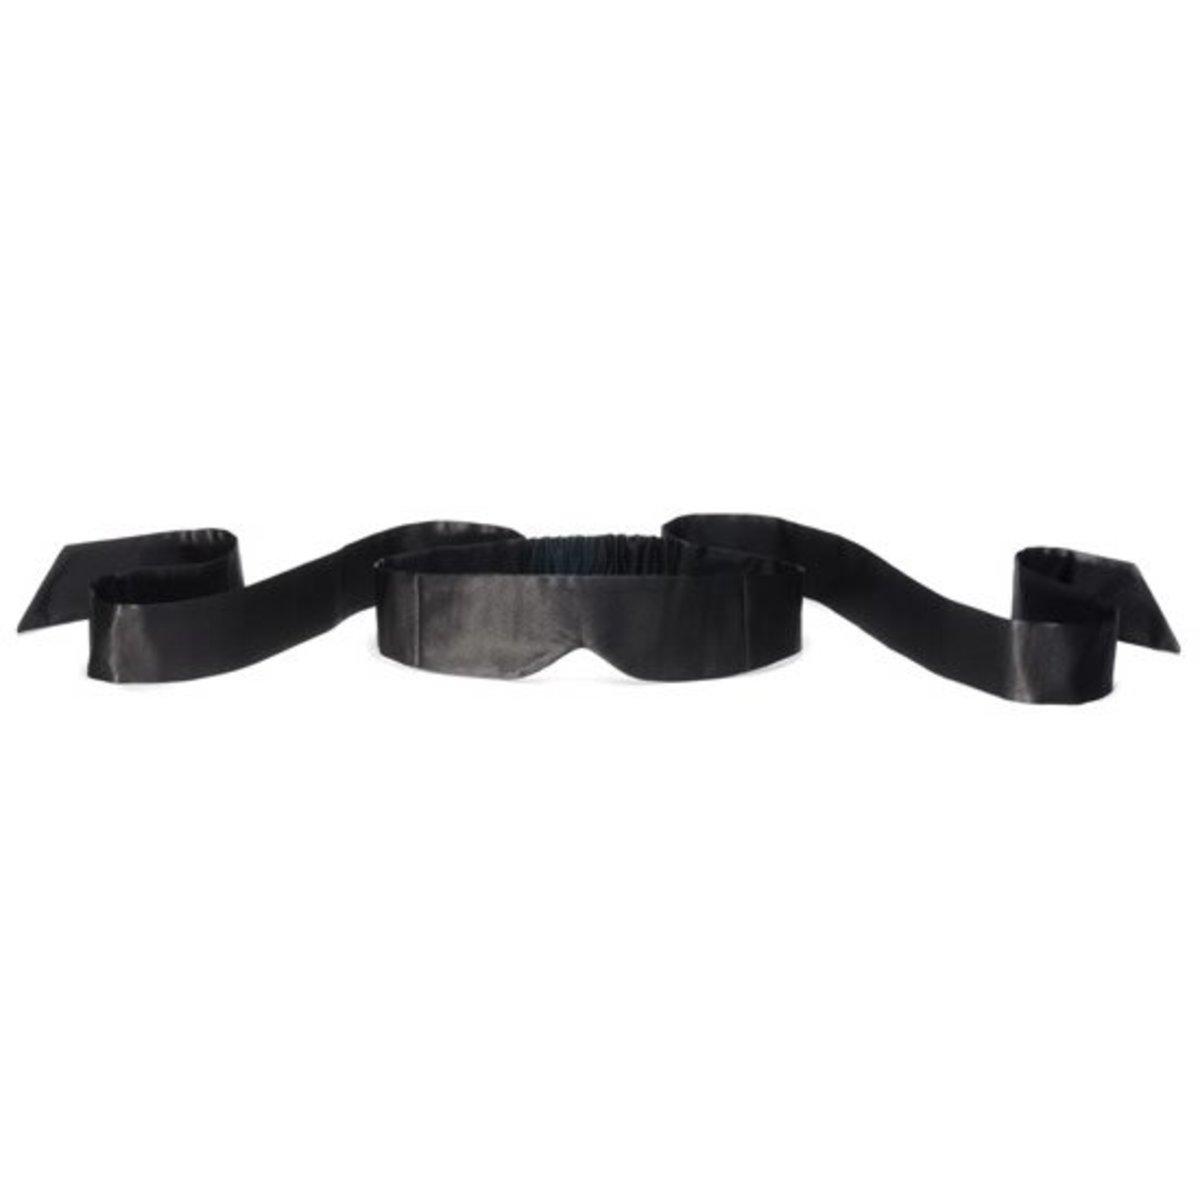 全絲眼罩 Intima Silk Blindfold - 黑色